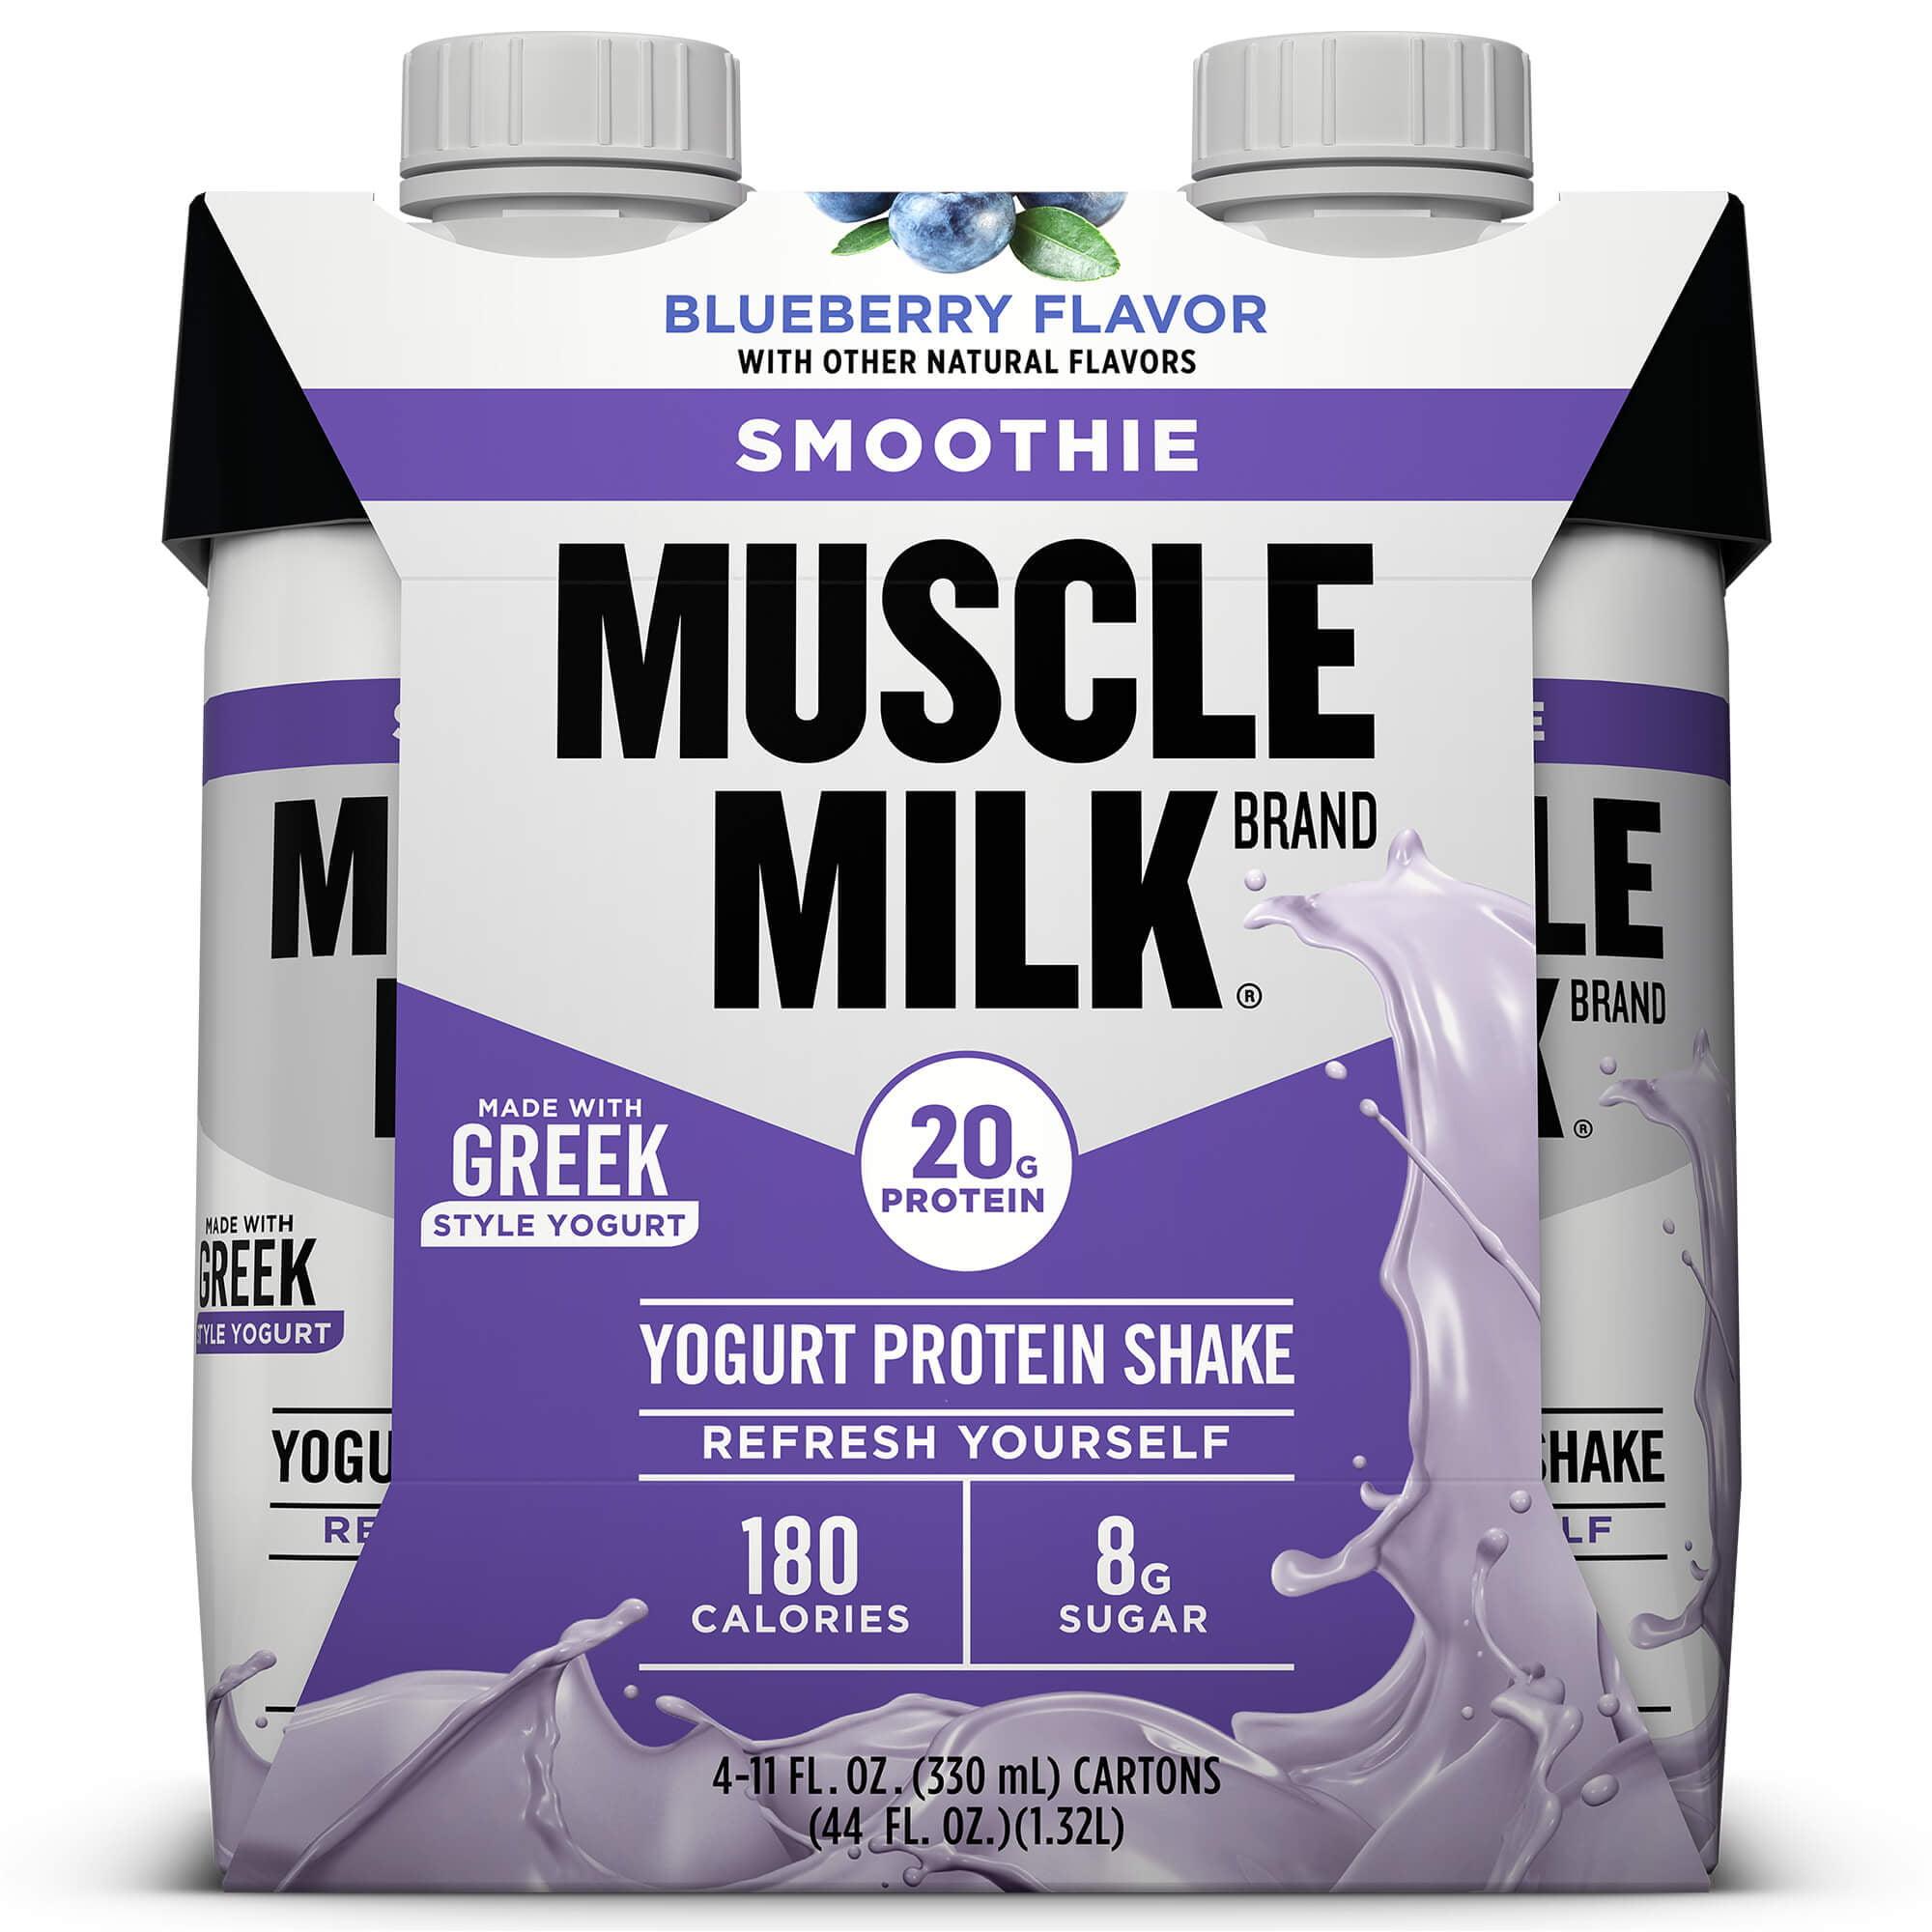 Muscle Milk Smoothie Yogurt Protein Shake, Blueberry, 20g Protein, Ready to Drink, 11 fl. oz., 4-Pack